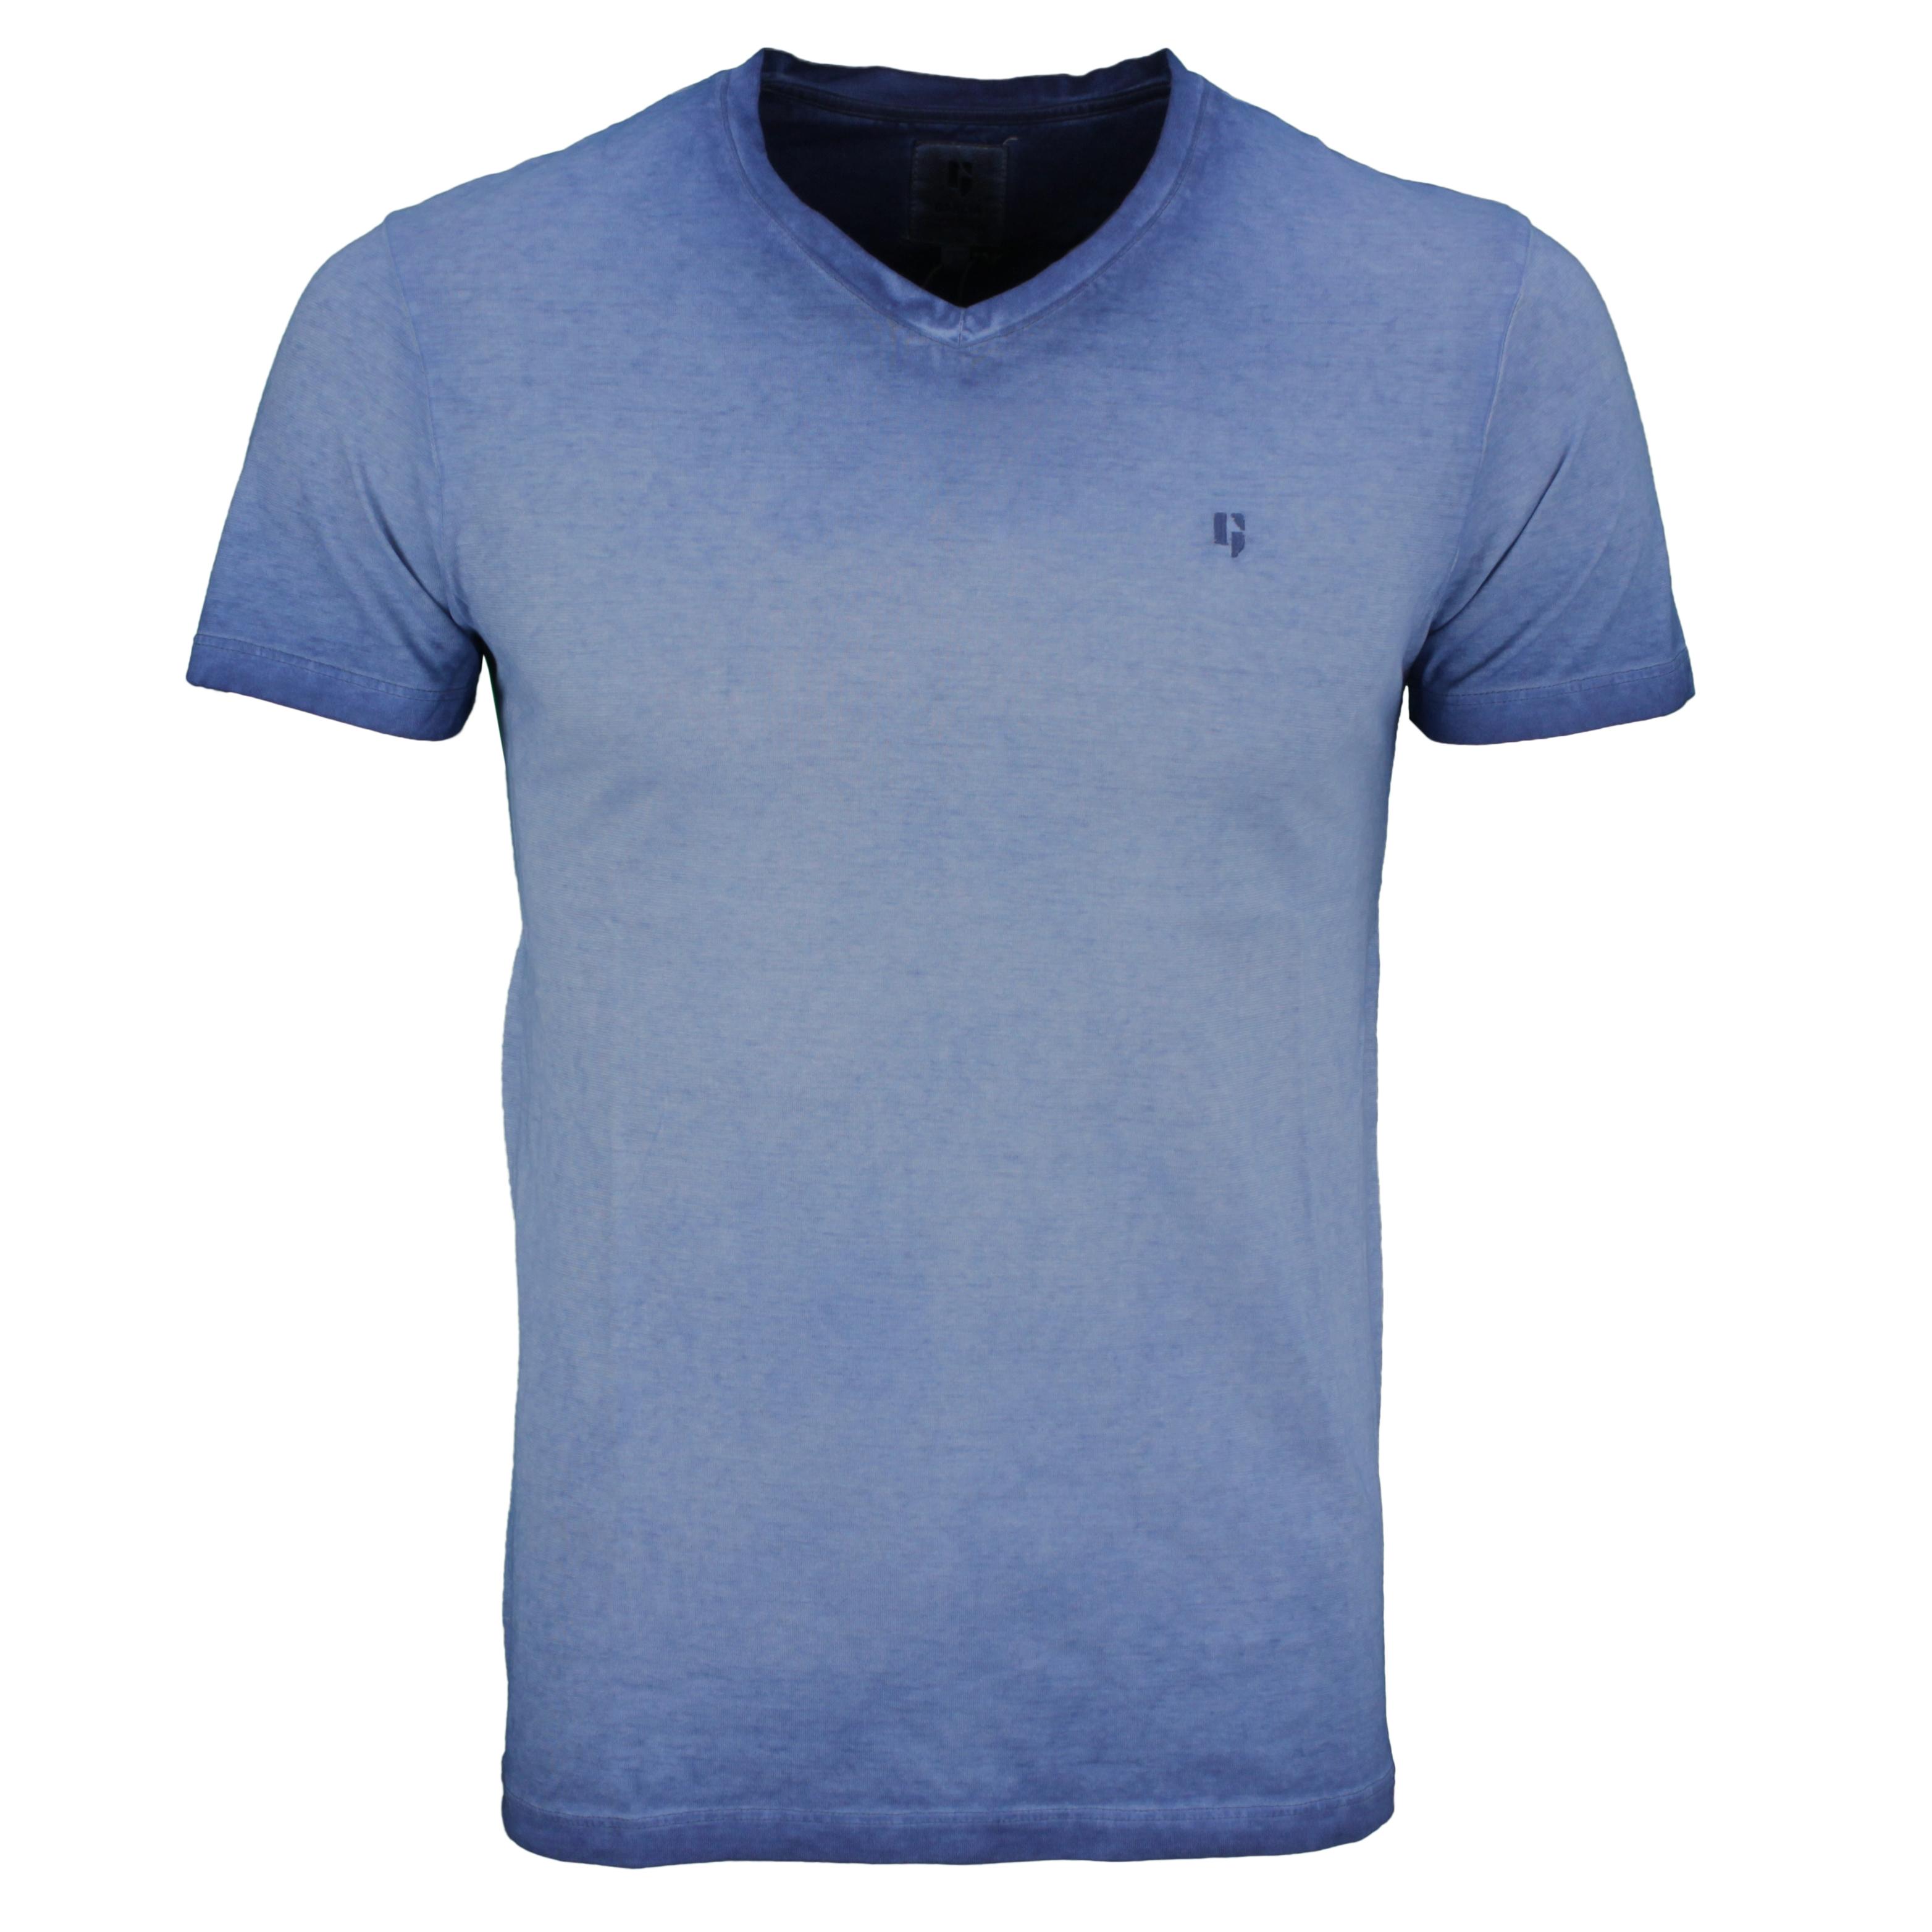 Garcia Herren T-Shirt Shirt kurzarm blau Used Look E11020 6632 imperial blue